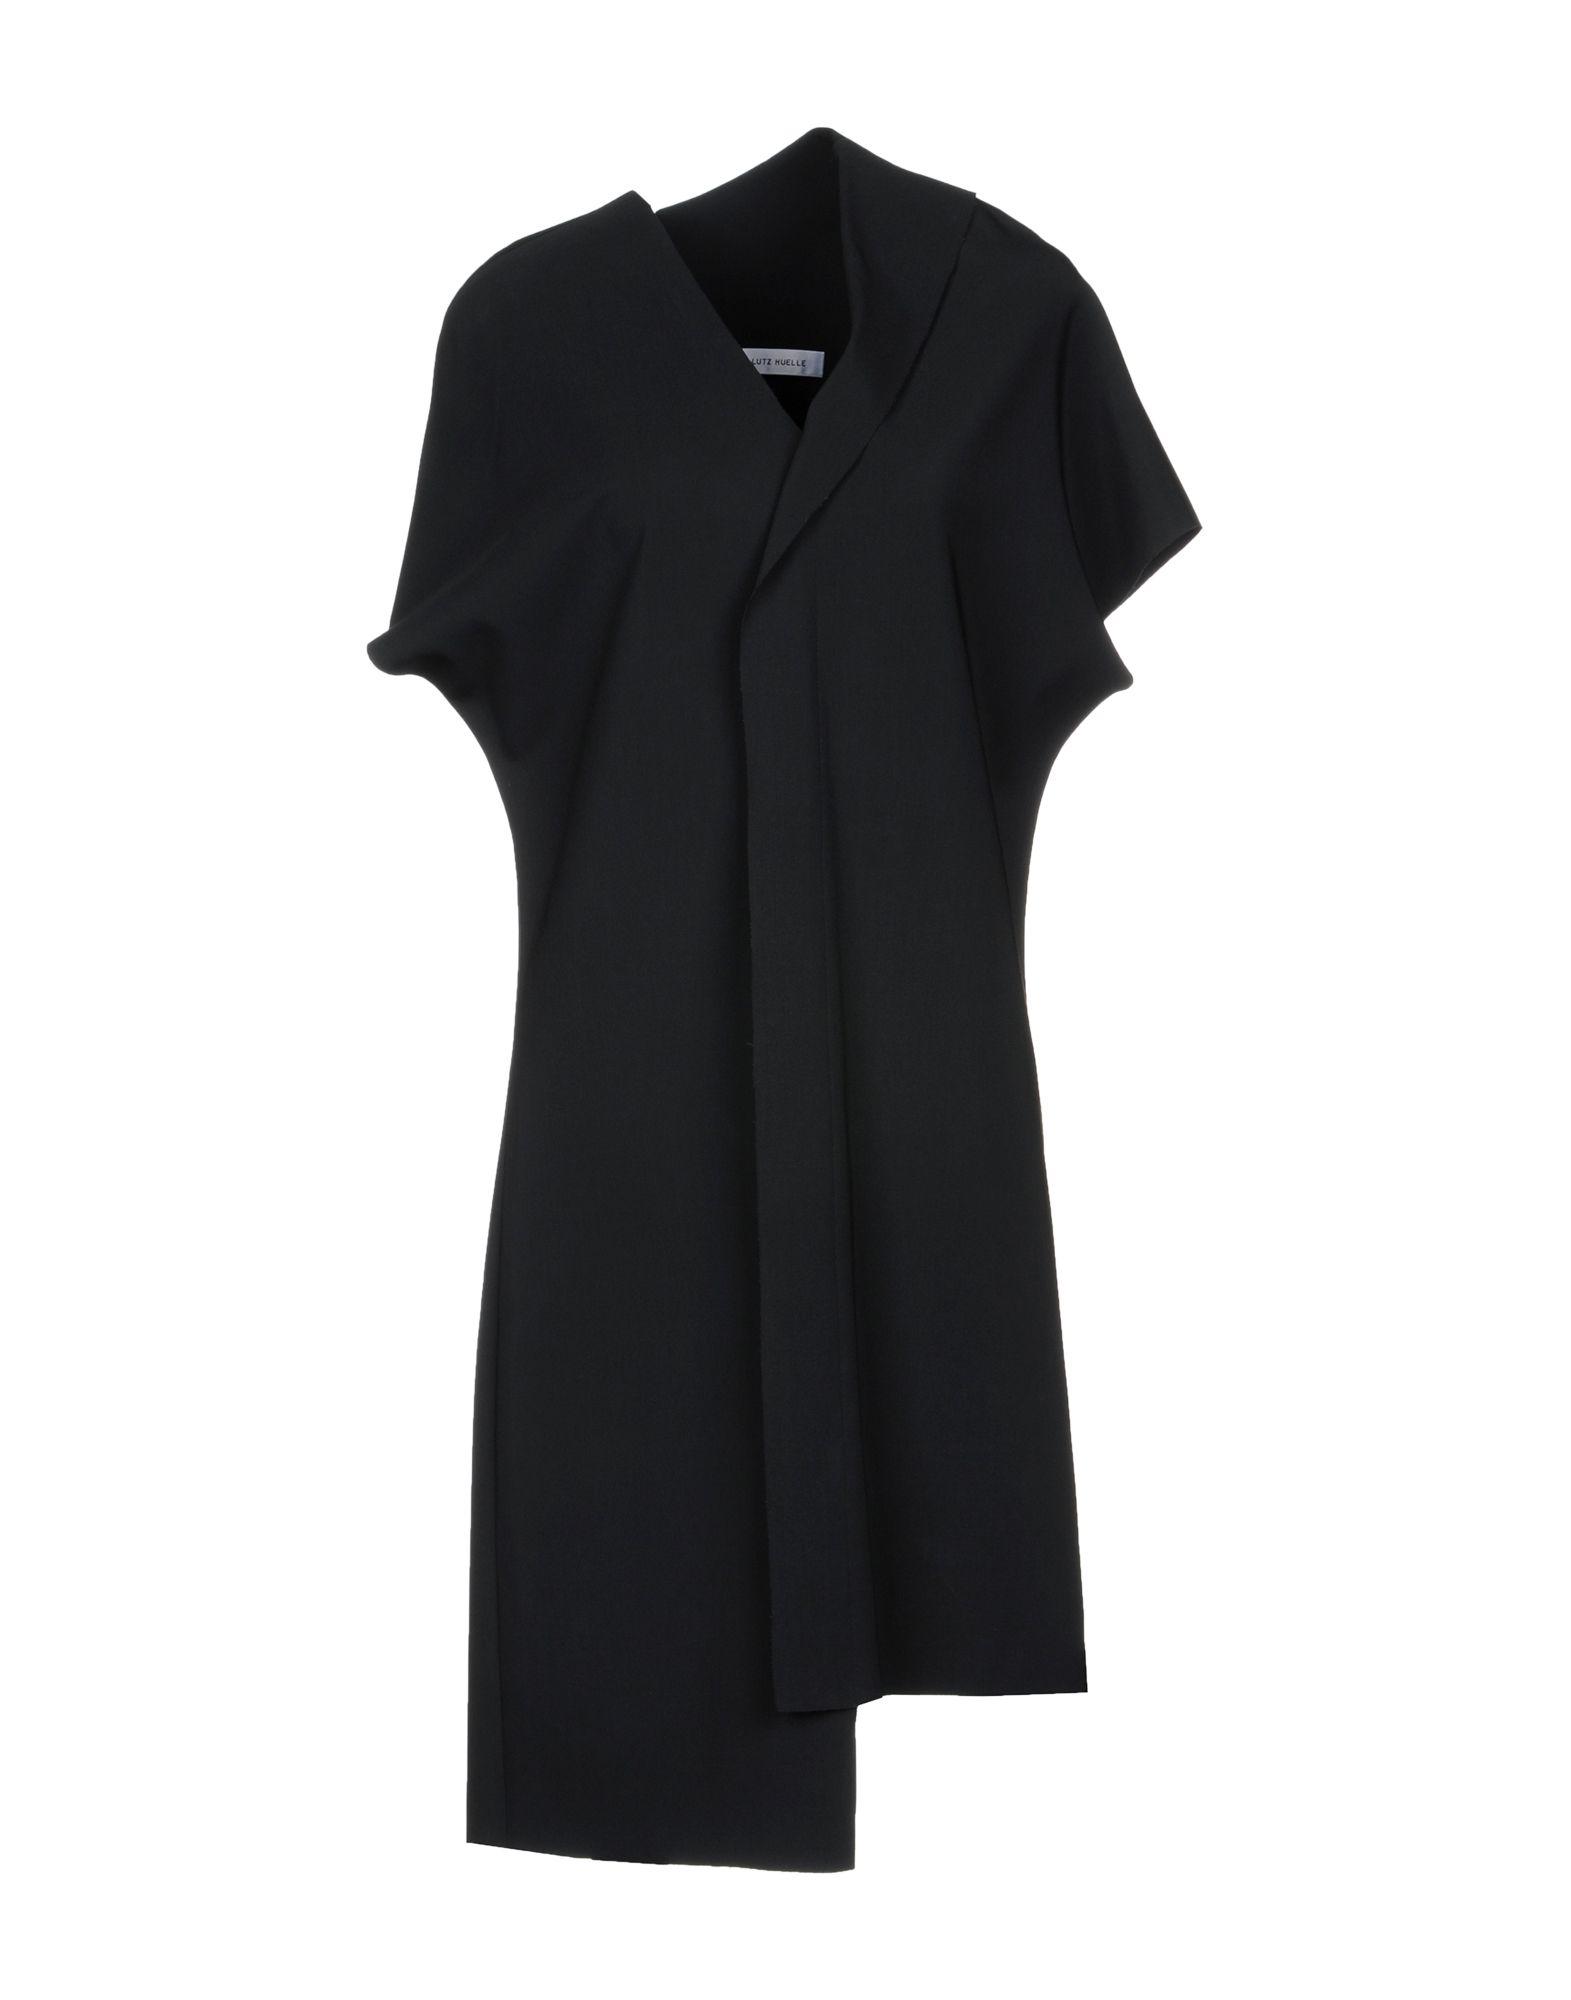 LUTZ HUELLE Knee-Length Dress in Black